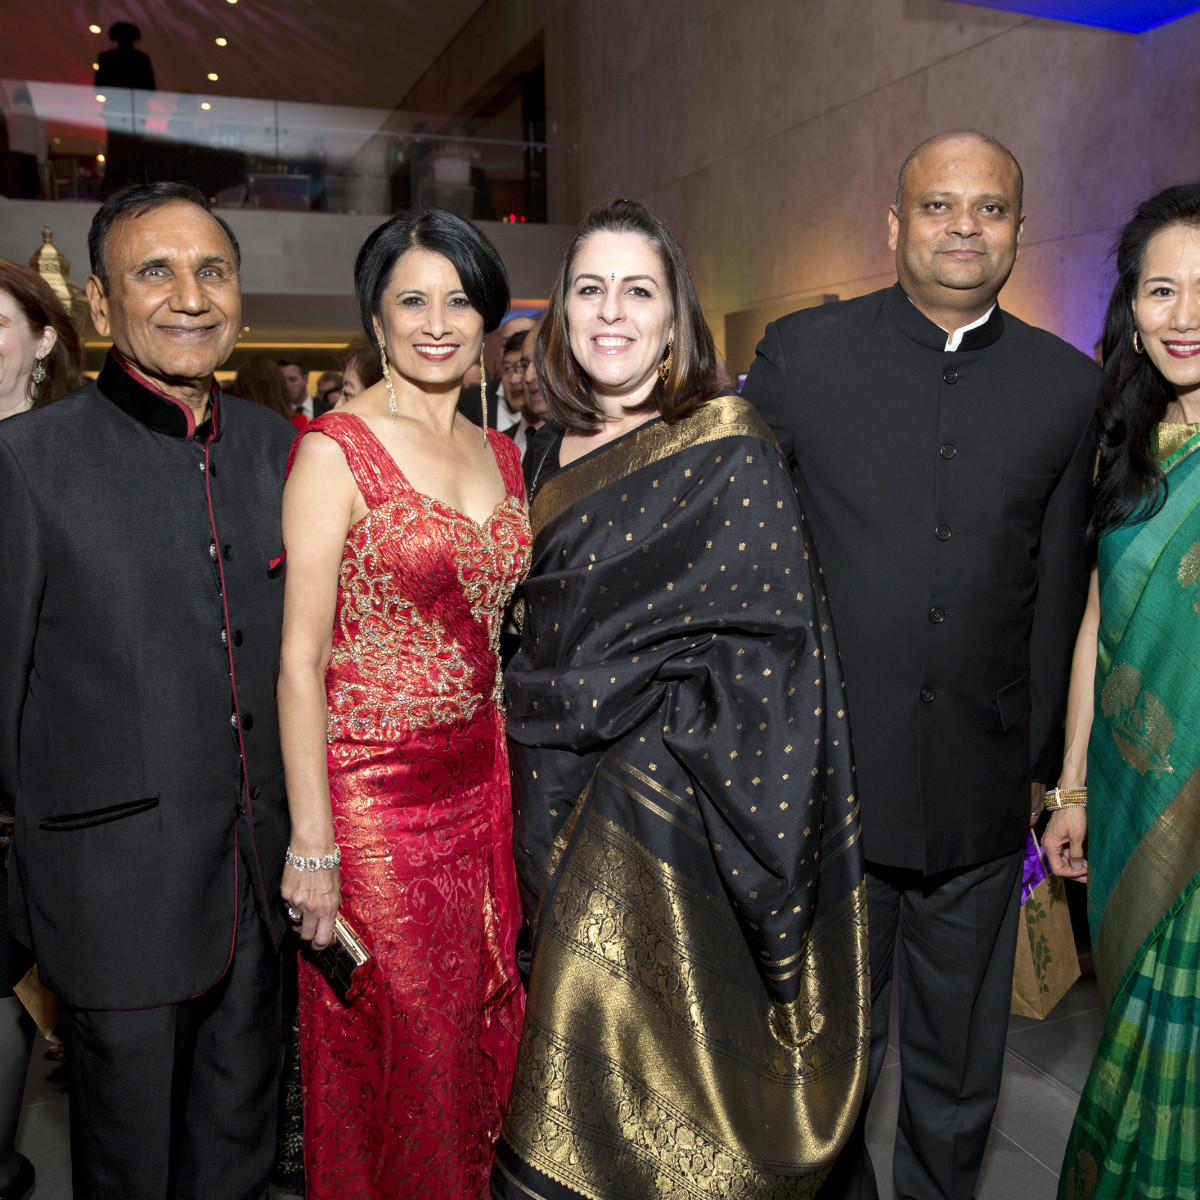 Houston, Tiger Ball, March 2017, Suresh Khator, Dr. Renu Khator, Dr. Amit Ray, consul general of India Anupam Ray, Y. Ping Sun